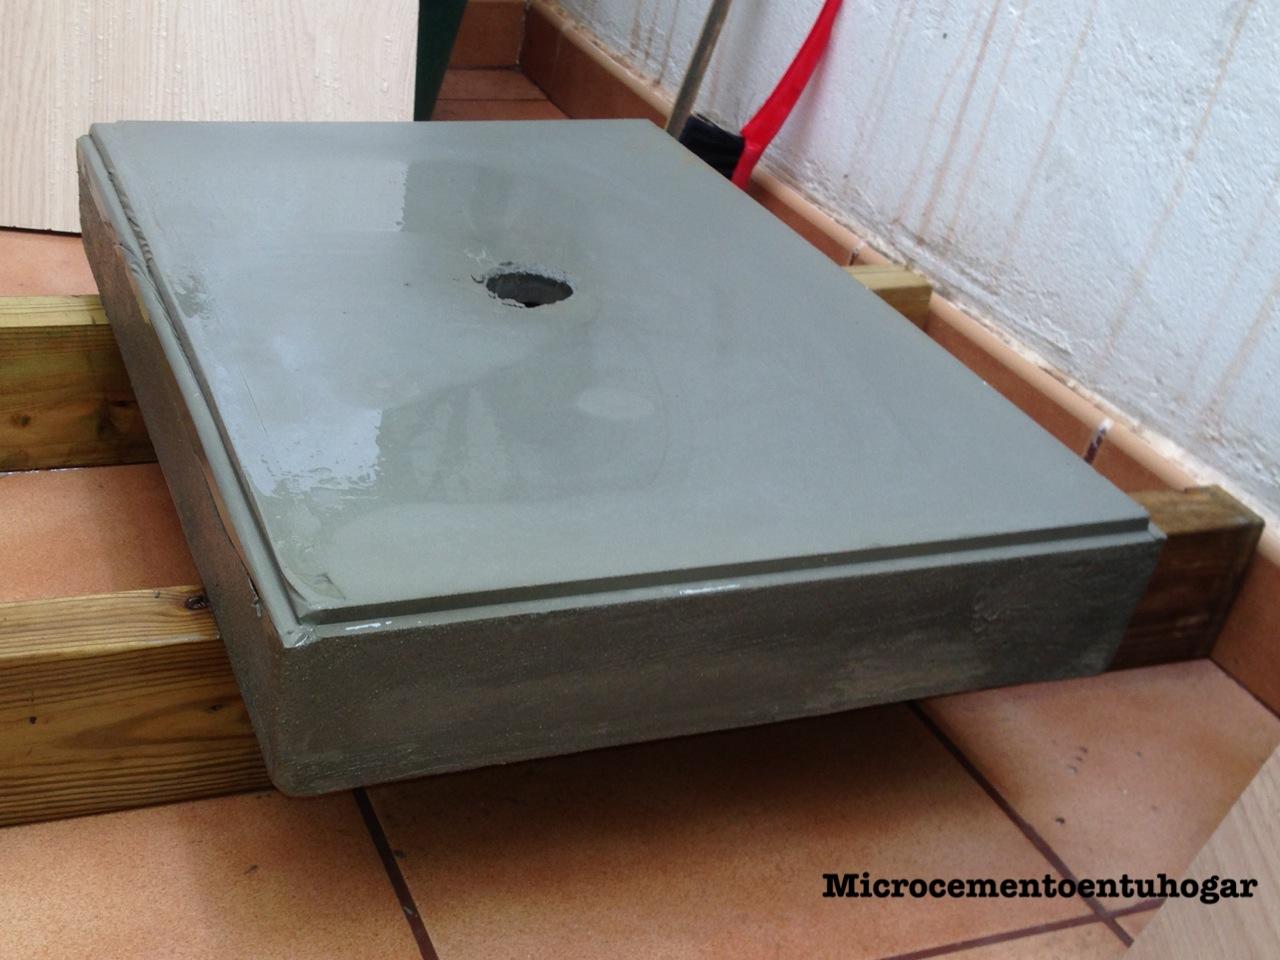 Microcemento en tu hogar mueble lavabo for Hacer mueble lavabo